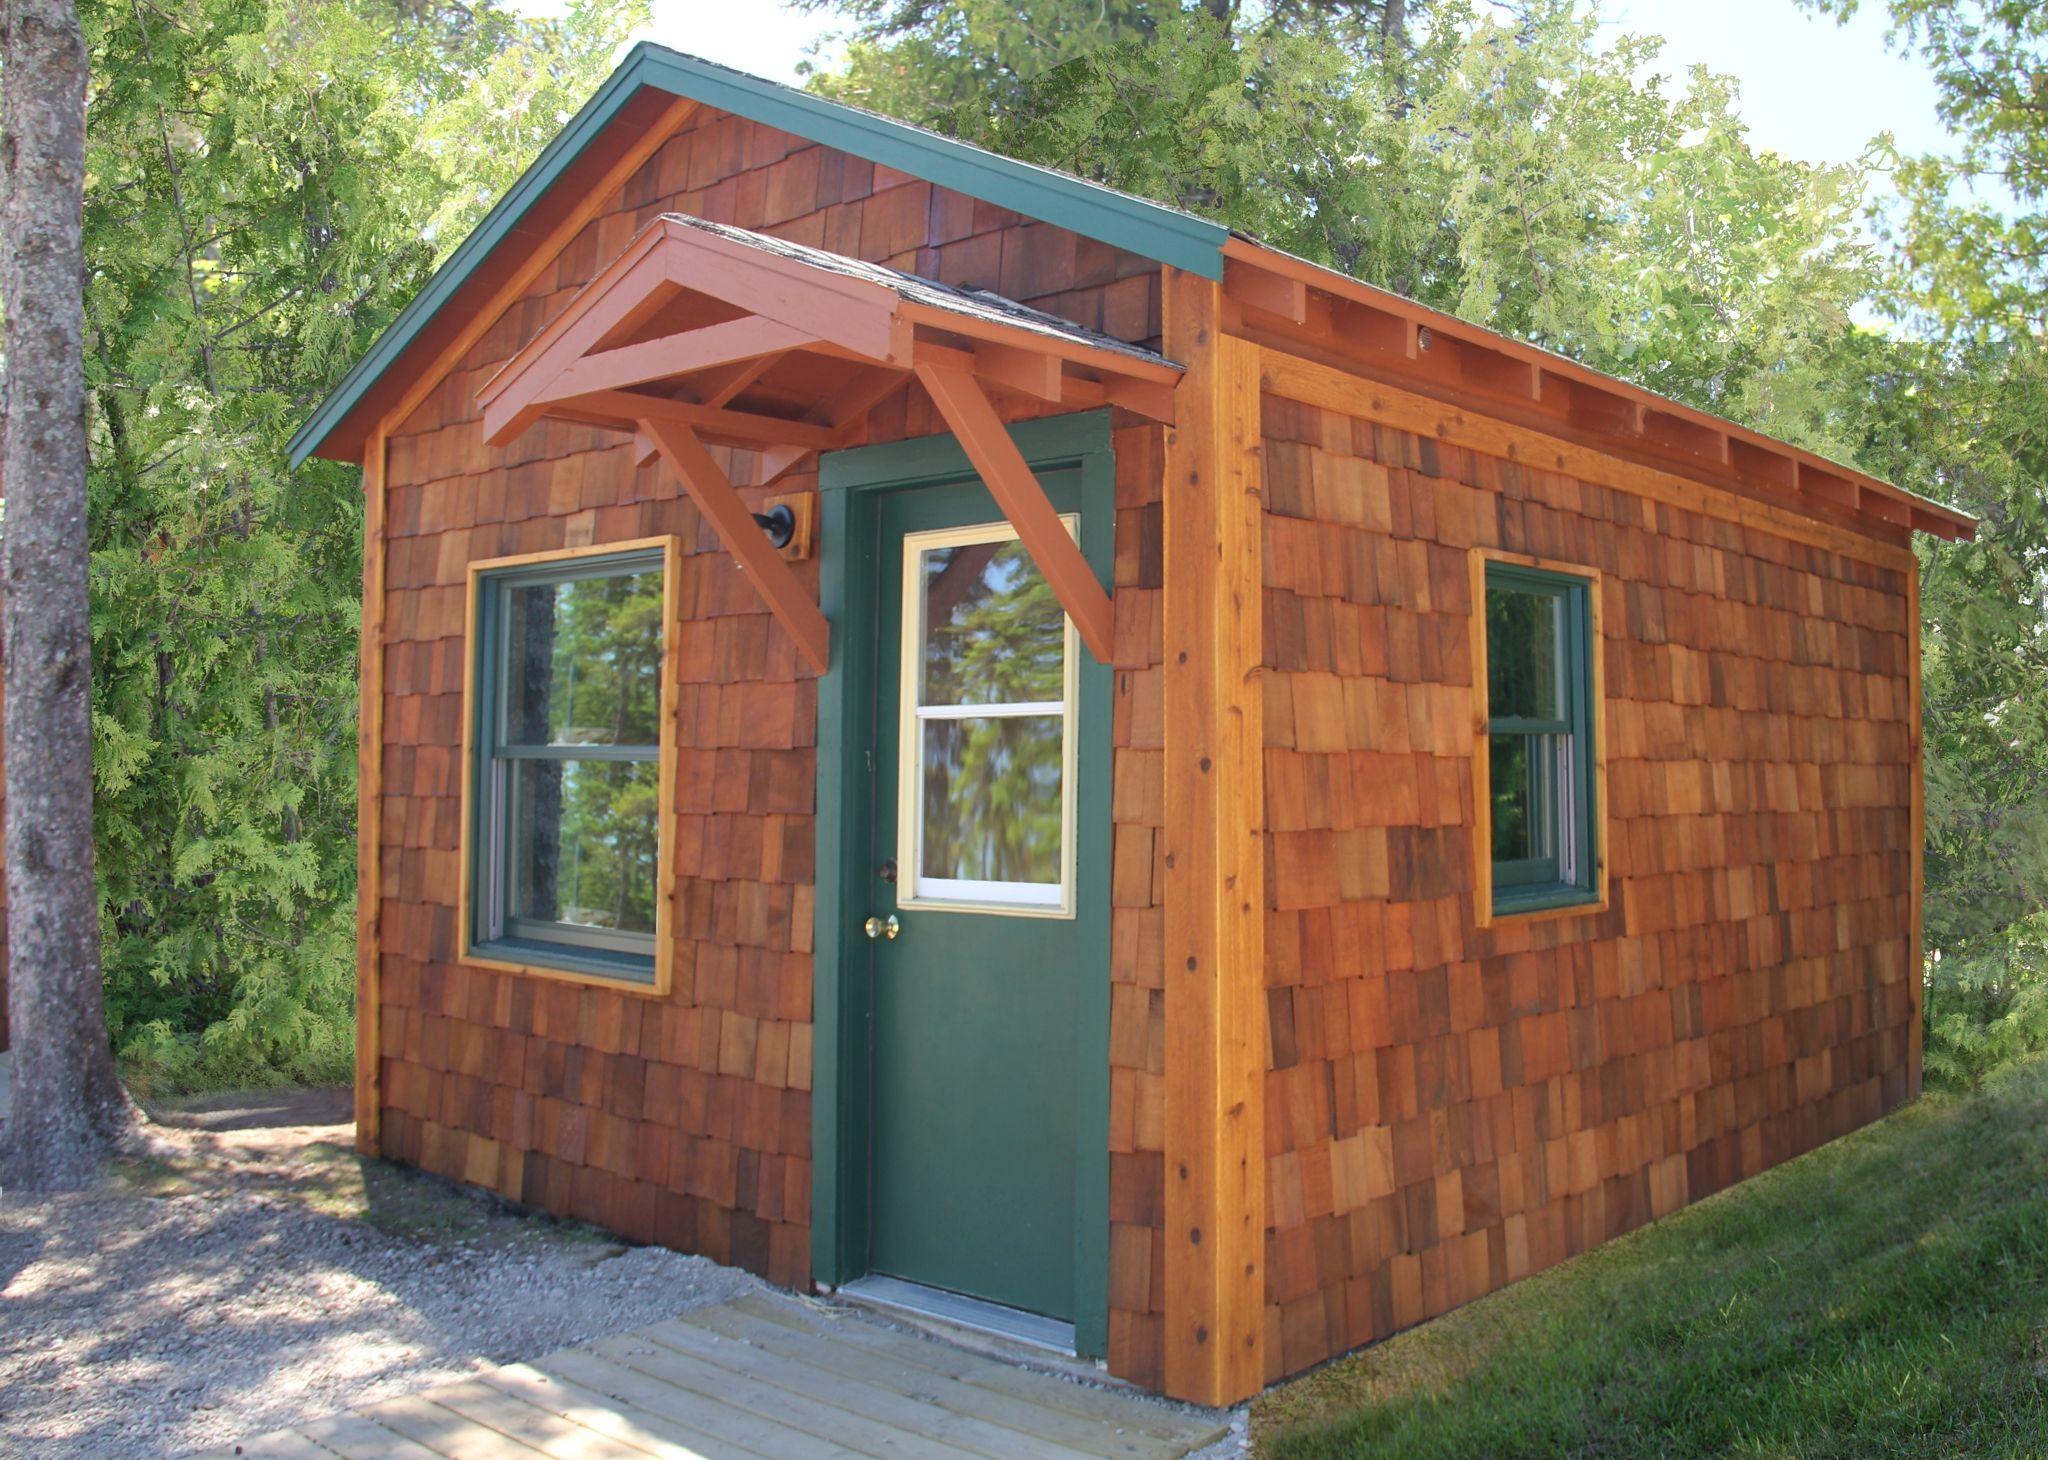 Superb Interior And Exterior Cabin Views At Mackinac Lakefront Cabin Rentals In  Mackinaw City, Michigan.